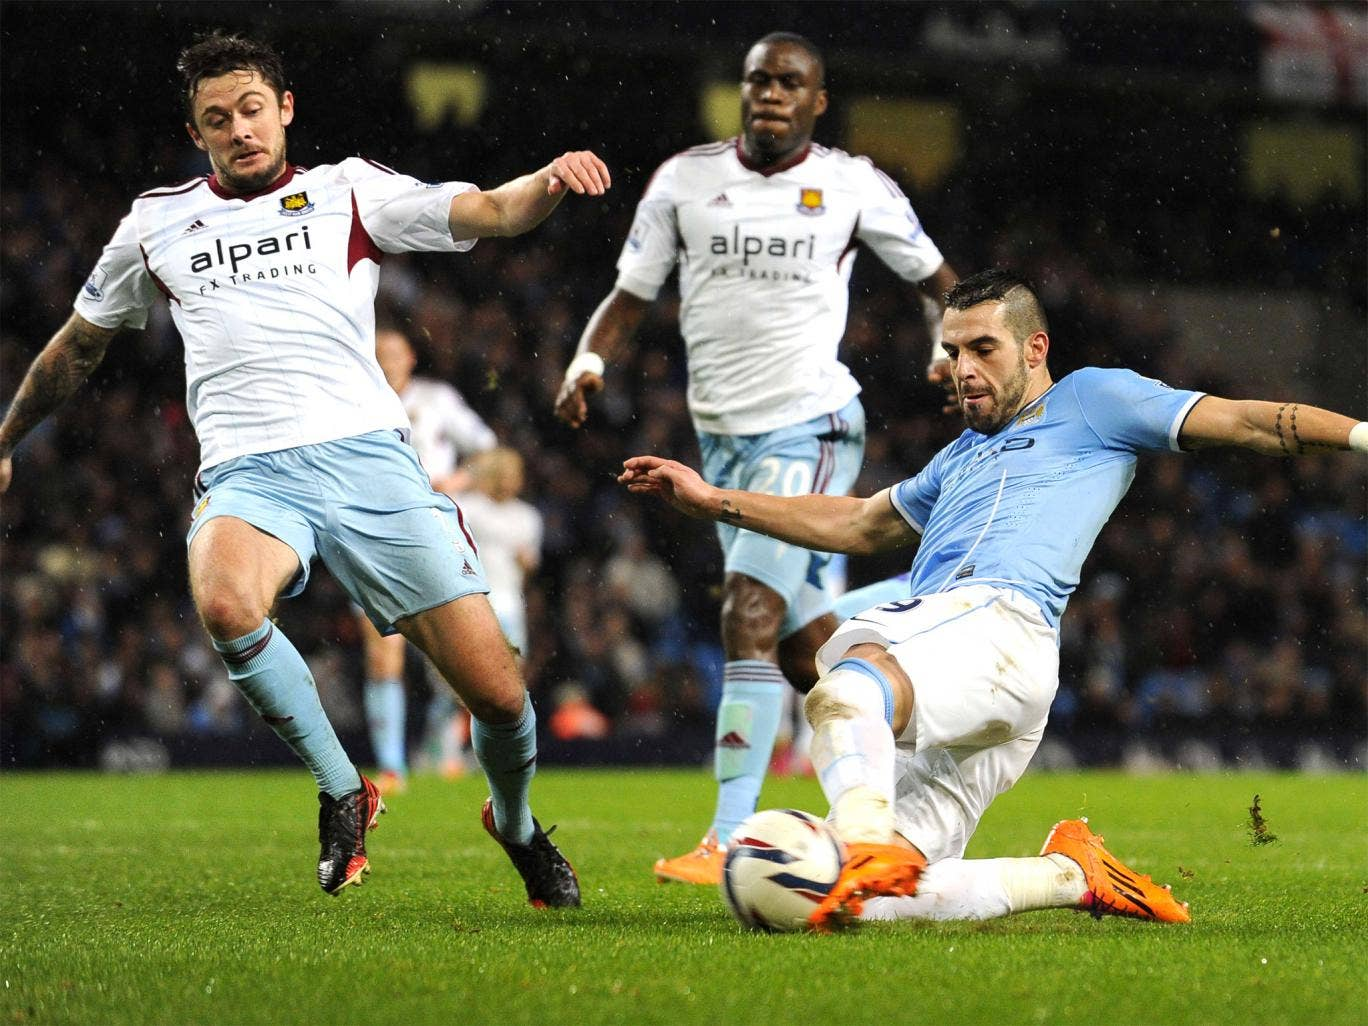 Alvaro Negredo slides in to score his second goal